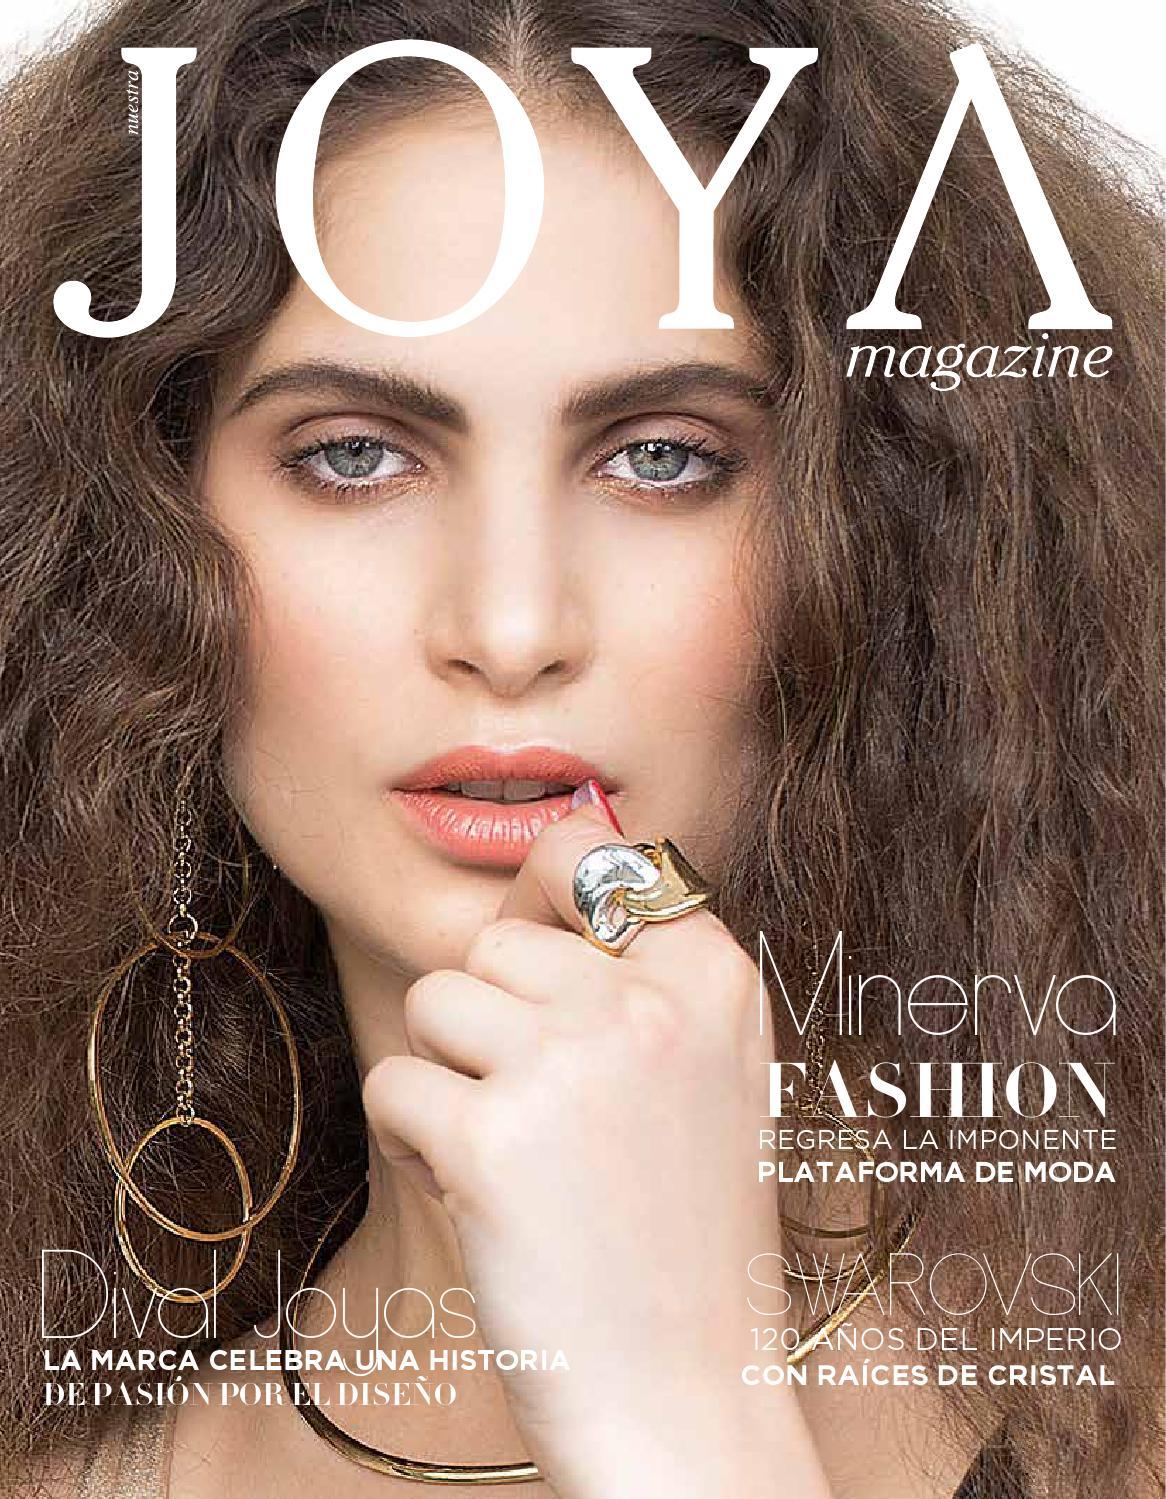 4d051a0a5e78 Joya Magazine 454 by Joya Magazine - issuu